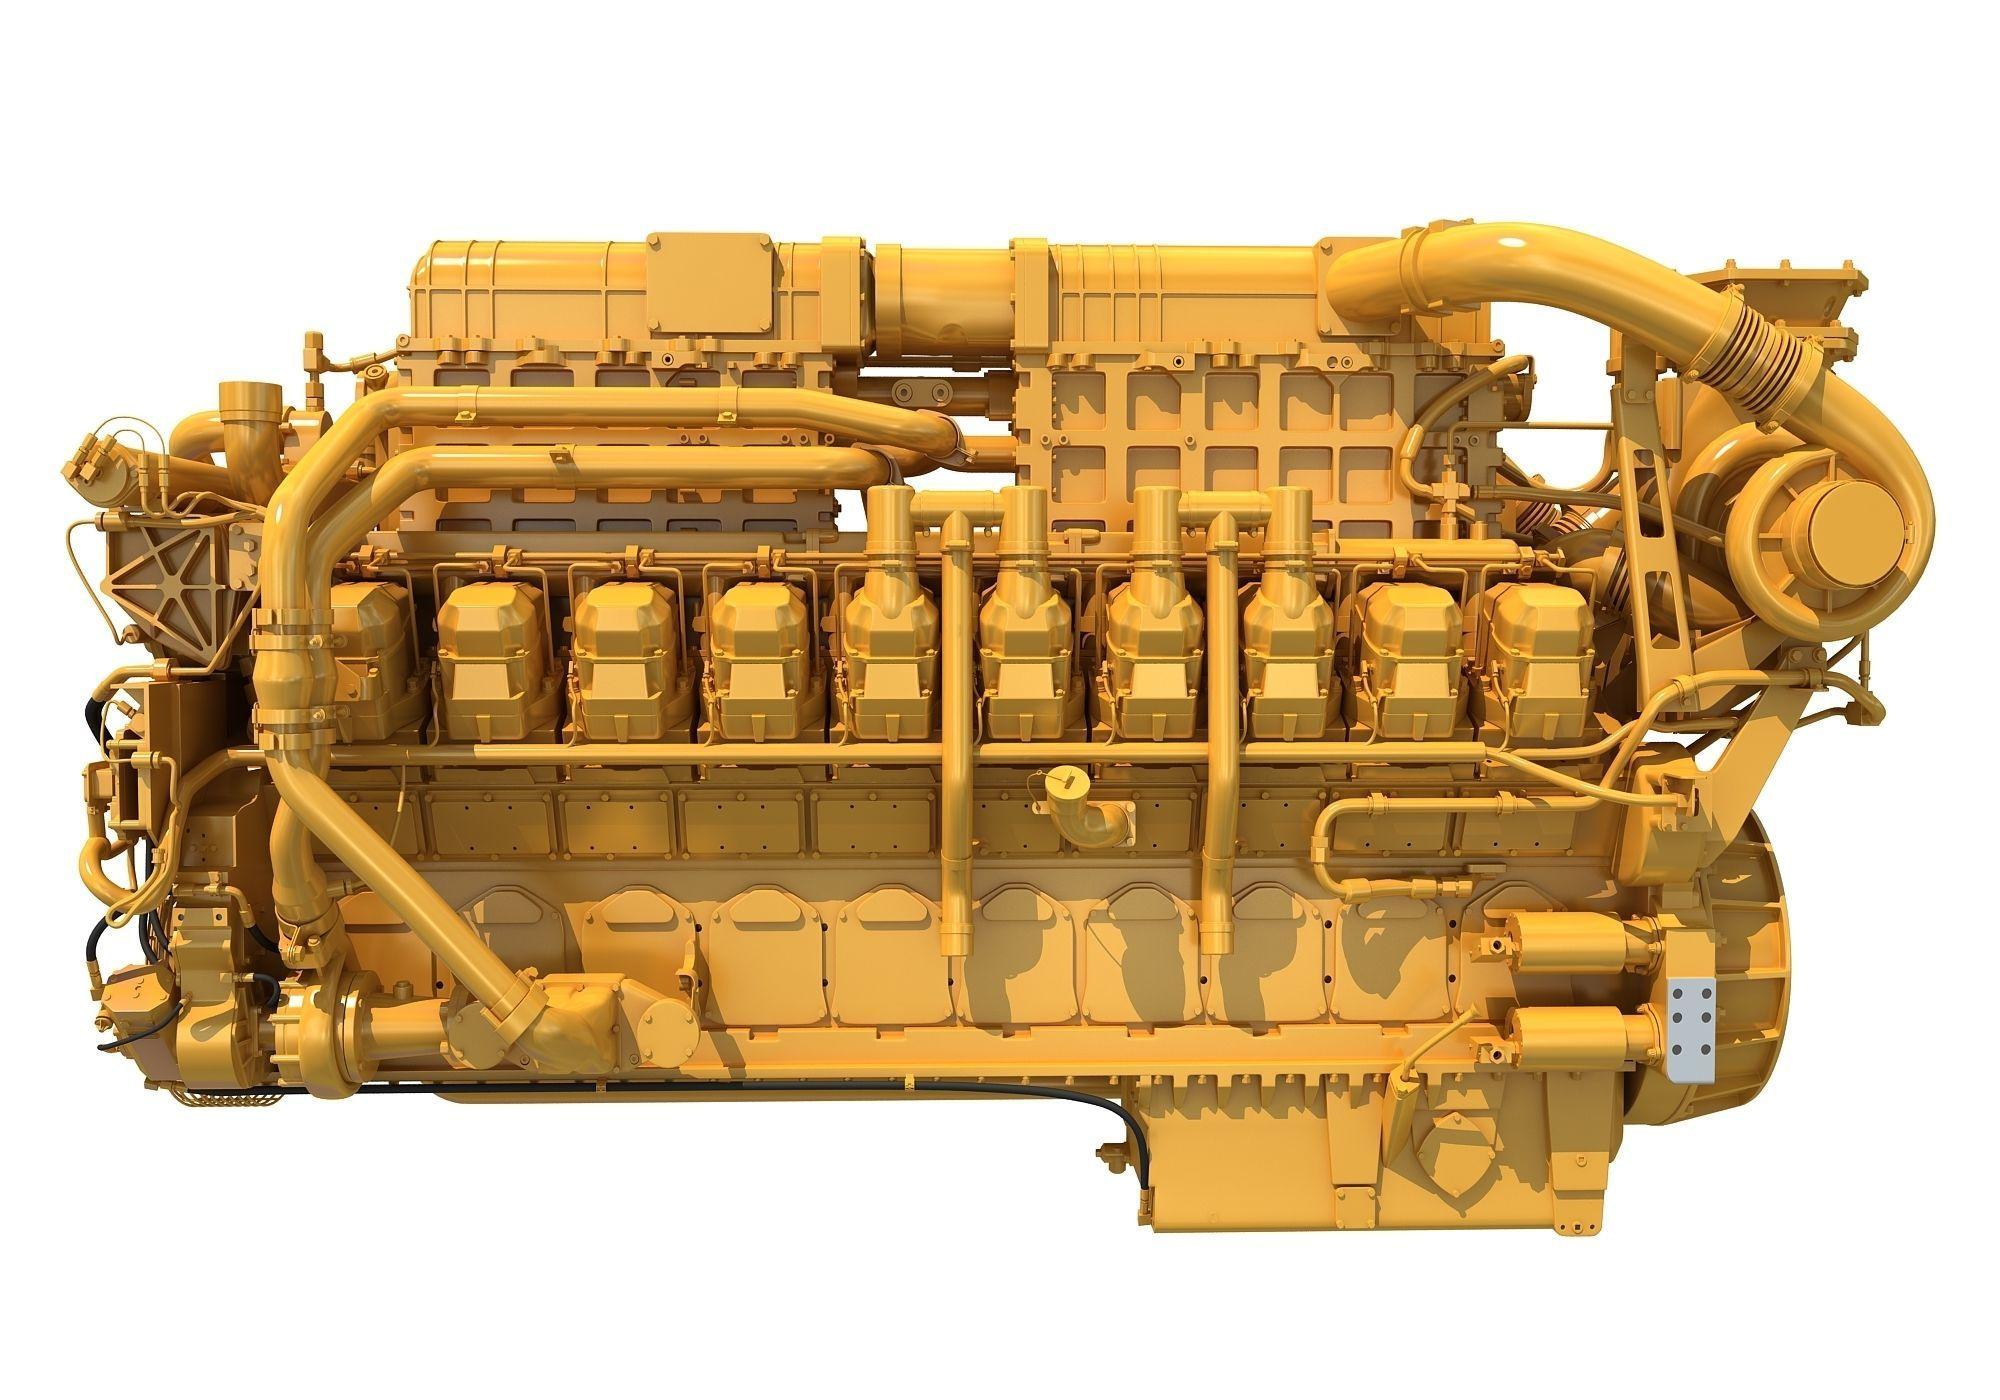 20 Cylinders Engine